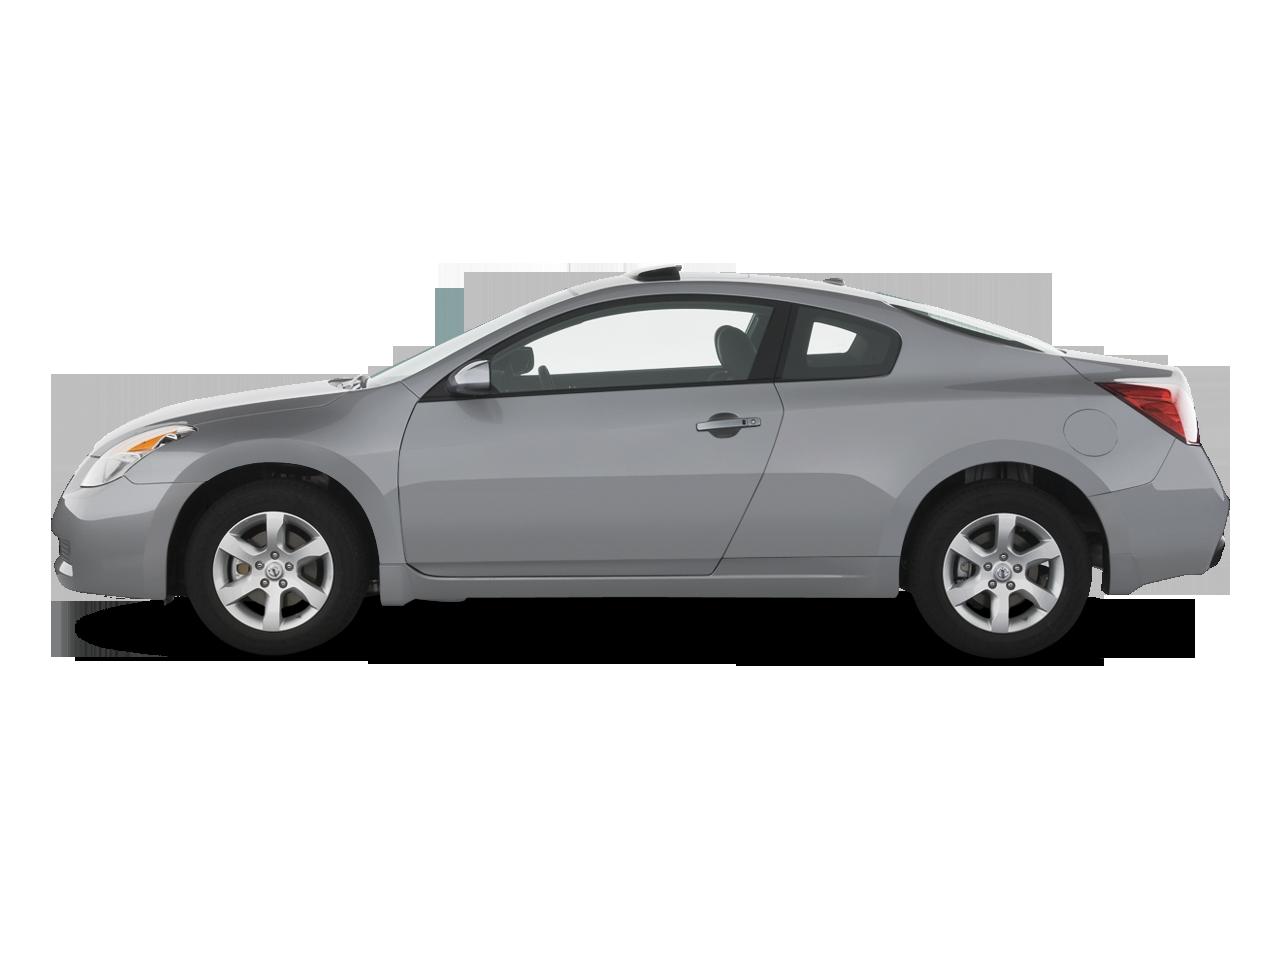 2009 nissan altima hybrid nissan hybrid sedan review automobile magazine. Black Bedroom Furniture Sets. Home Design Ideas